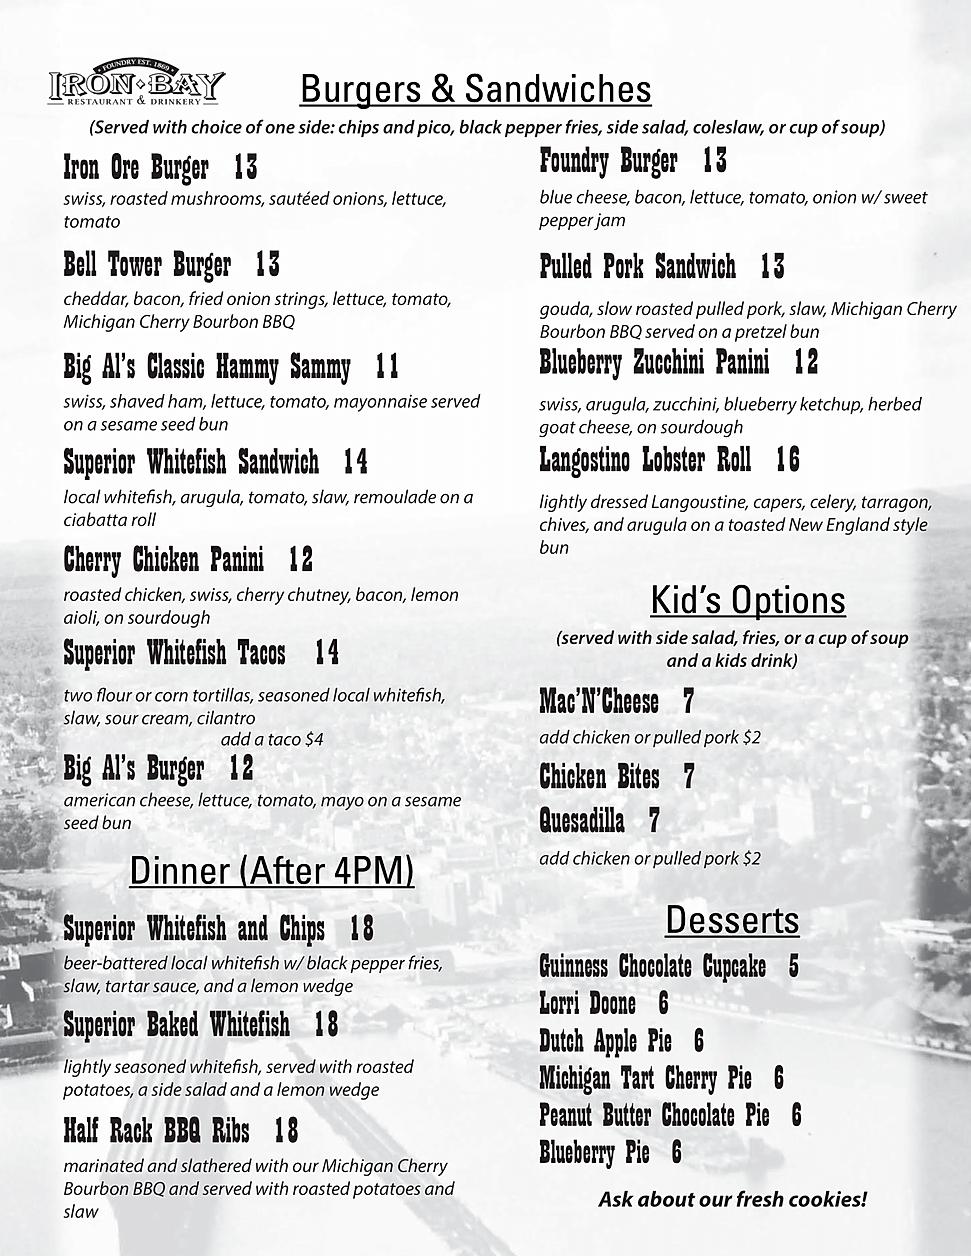 Iron bay restaurant drinkery taproom iron bay menu marquette restaurants